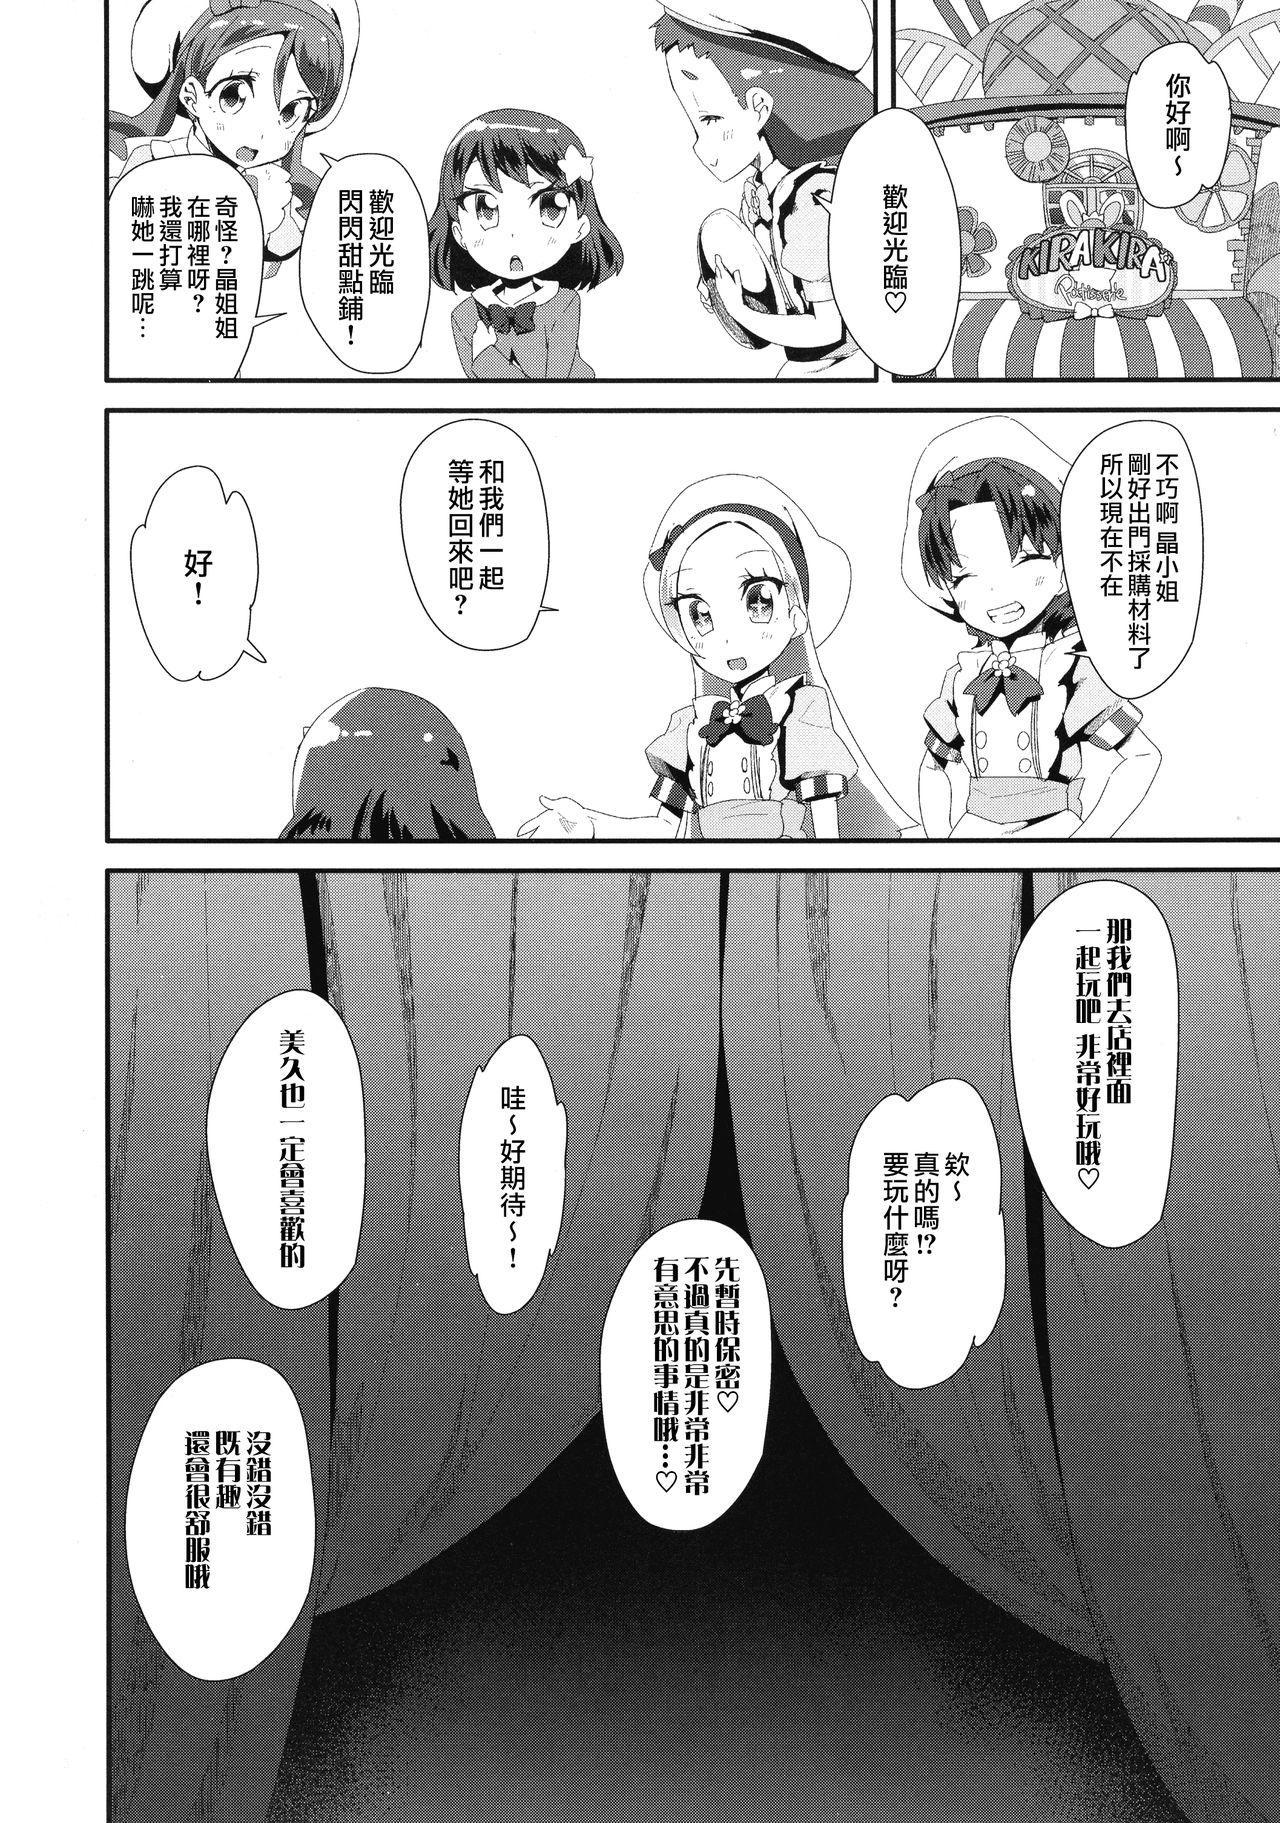 Hiru no KiraPâti e Youkoso 31